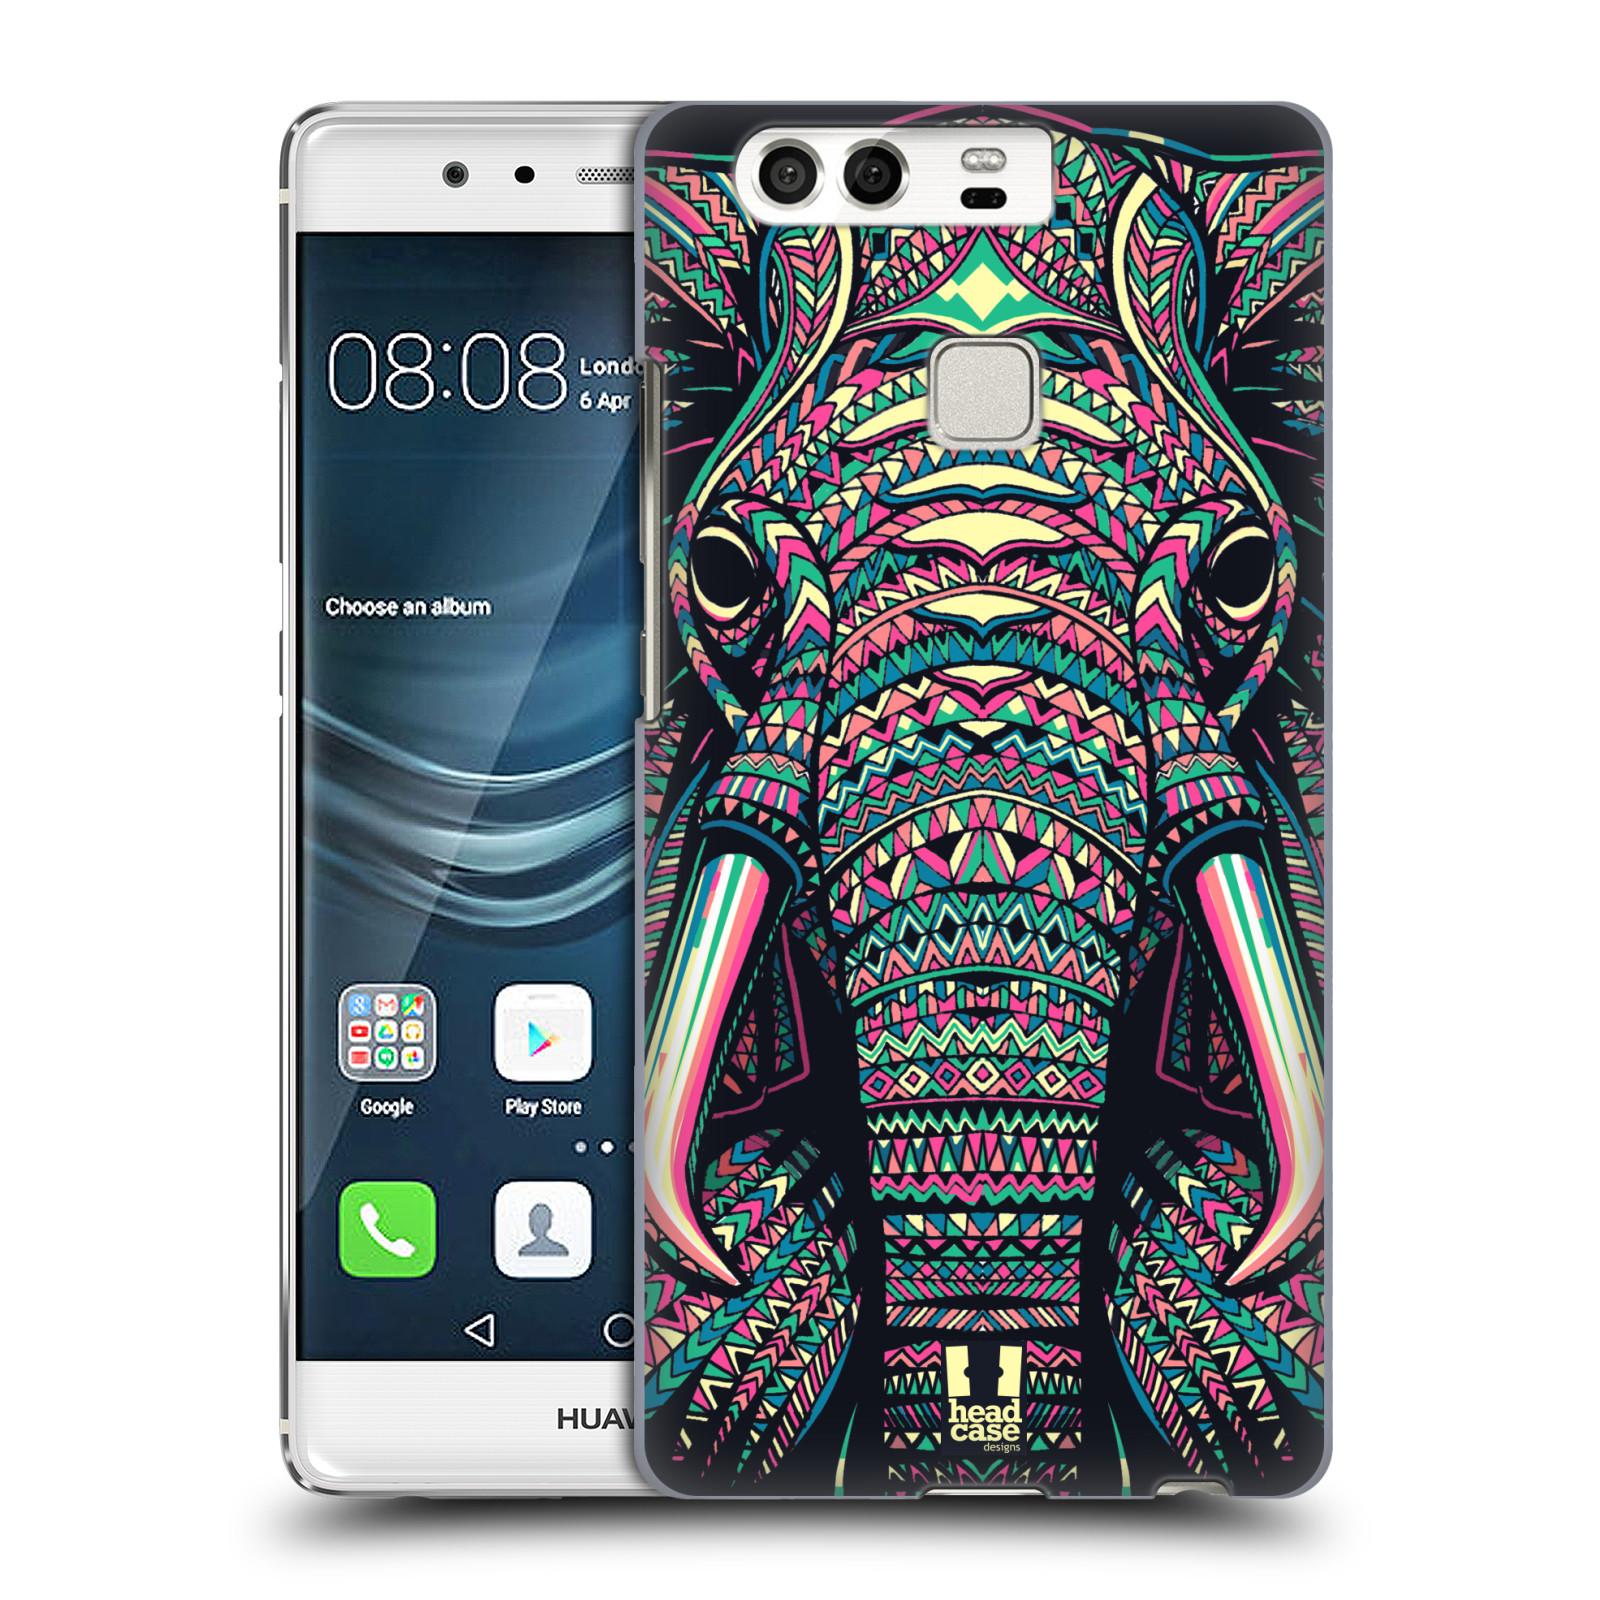 HEAD CASE plastový obal na mobil Huawei P9 / P9 DUAL SIM vzor Aztécký motiv zvíře 2 slon